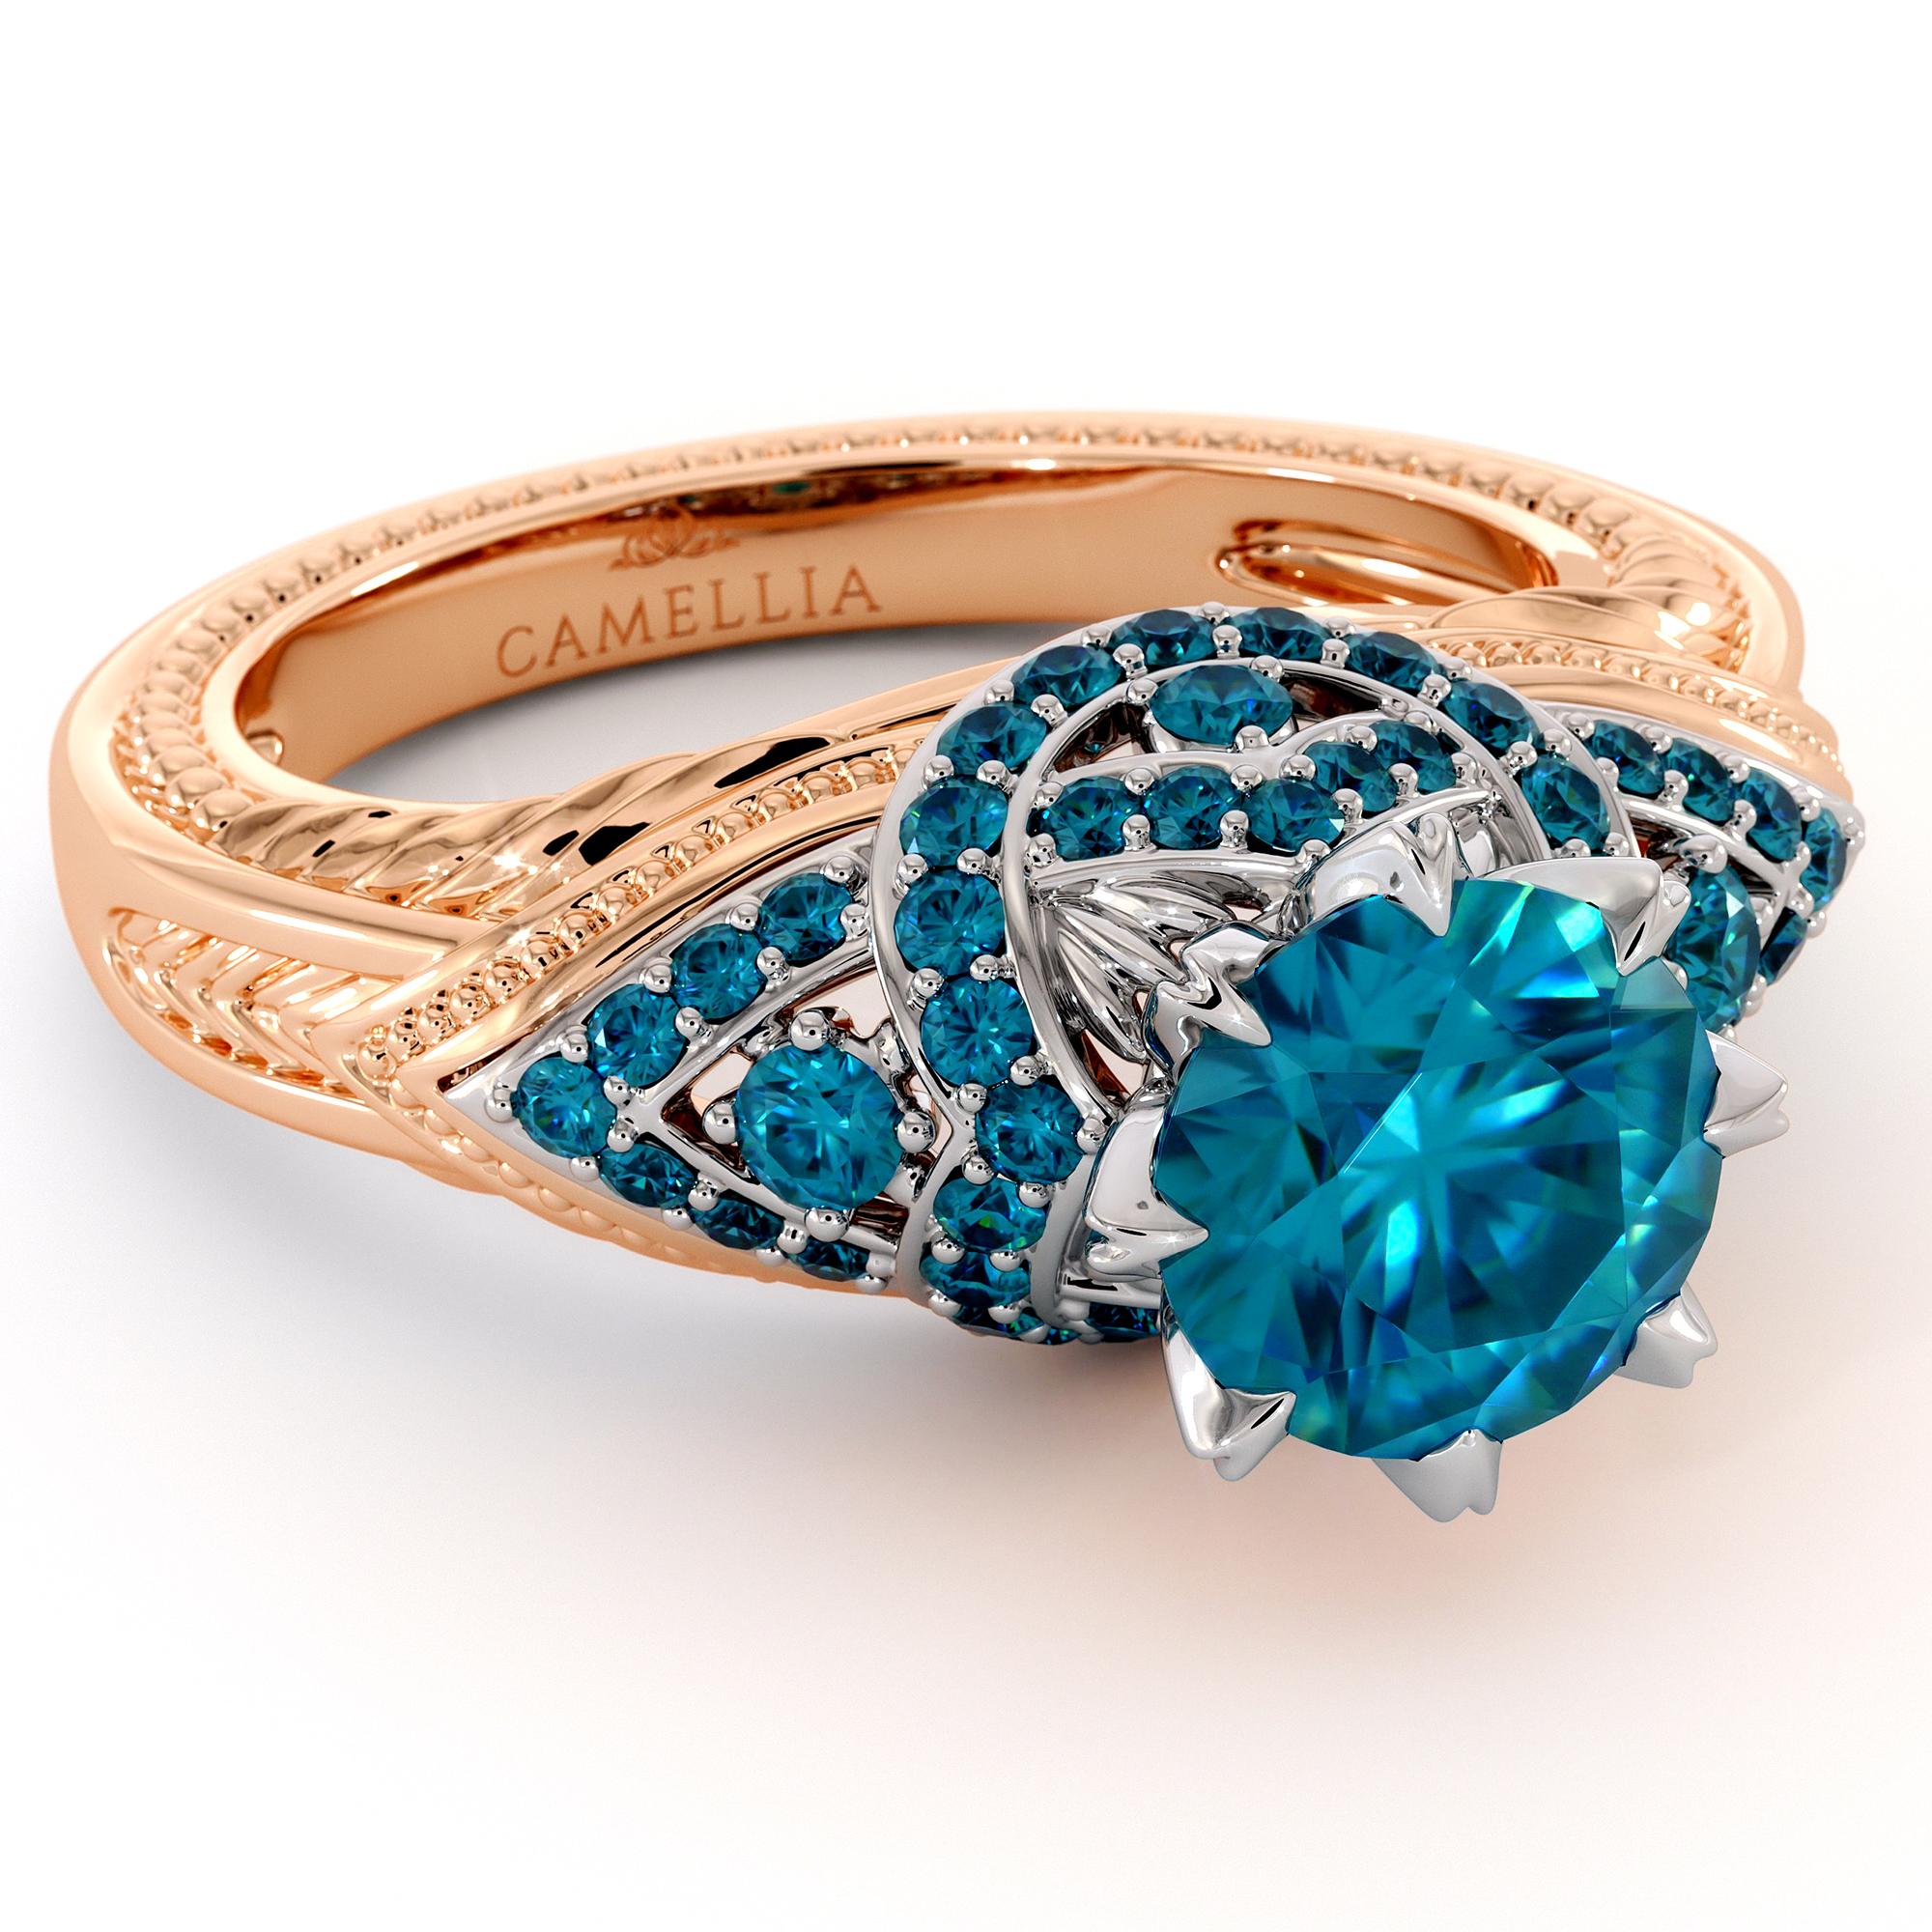 Kingly Blue Diamonds Engagement Ring 2.0 Ct. Round Blue Diamond Ring 2 Toned Gold Engagement Ring Unique Milgrain Ring